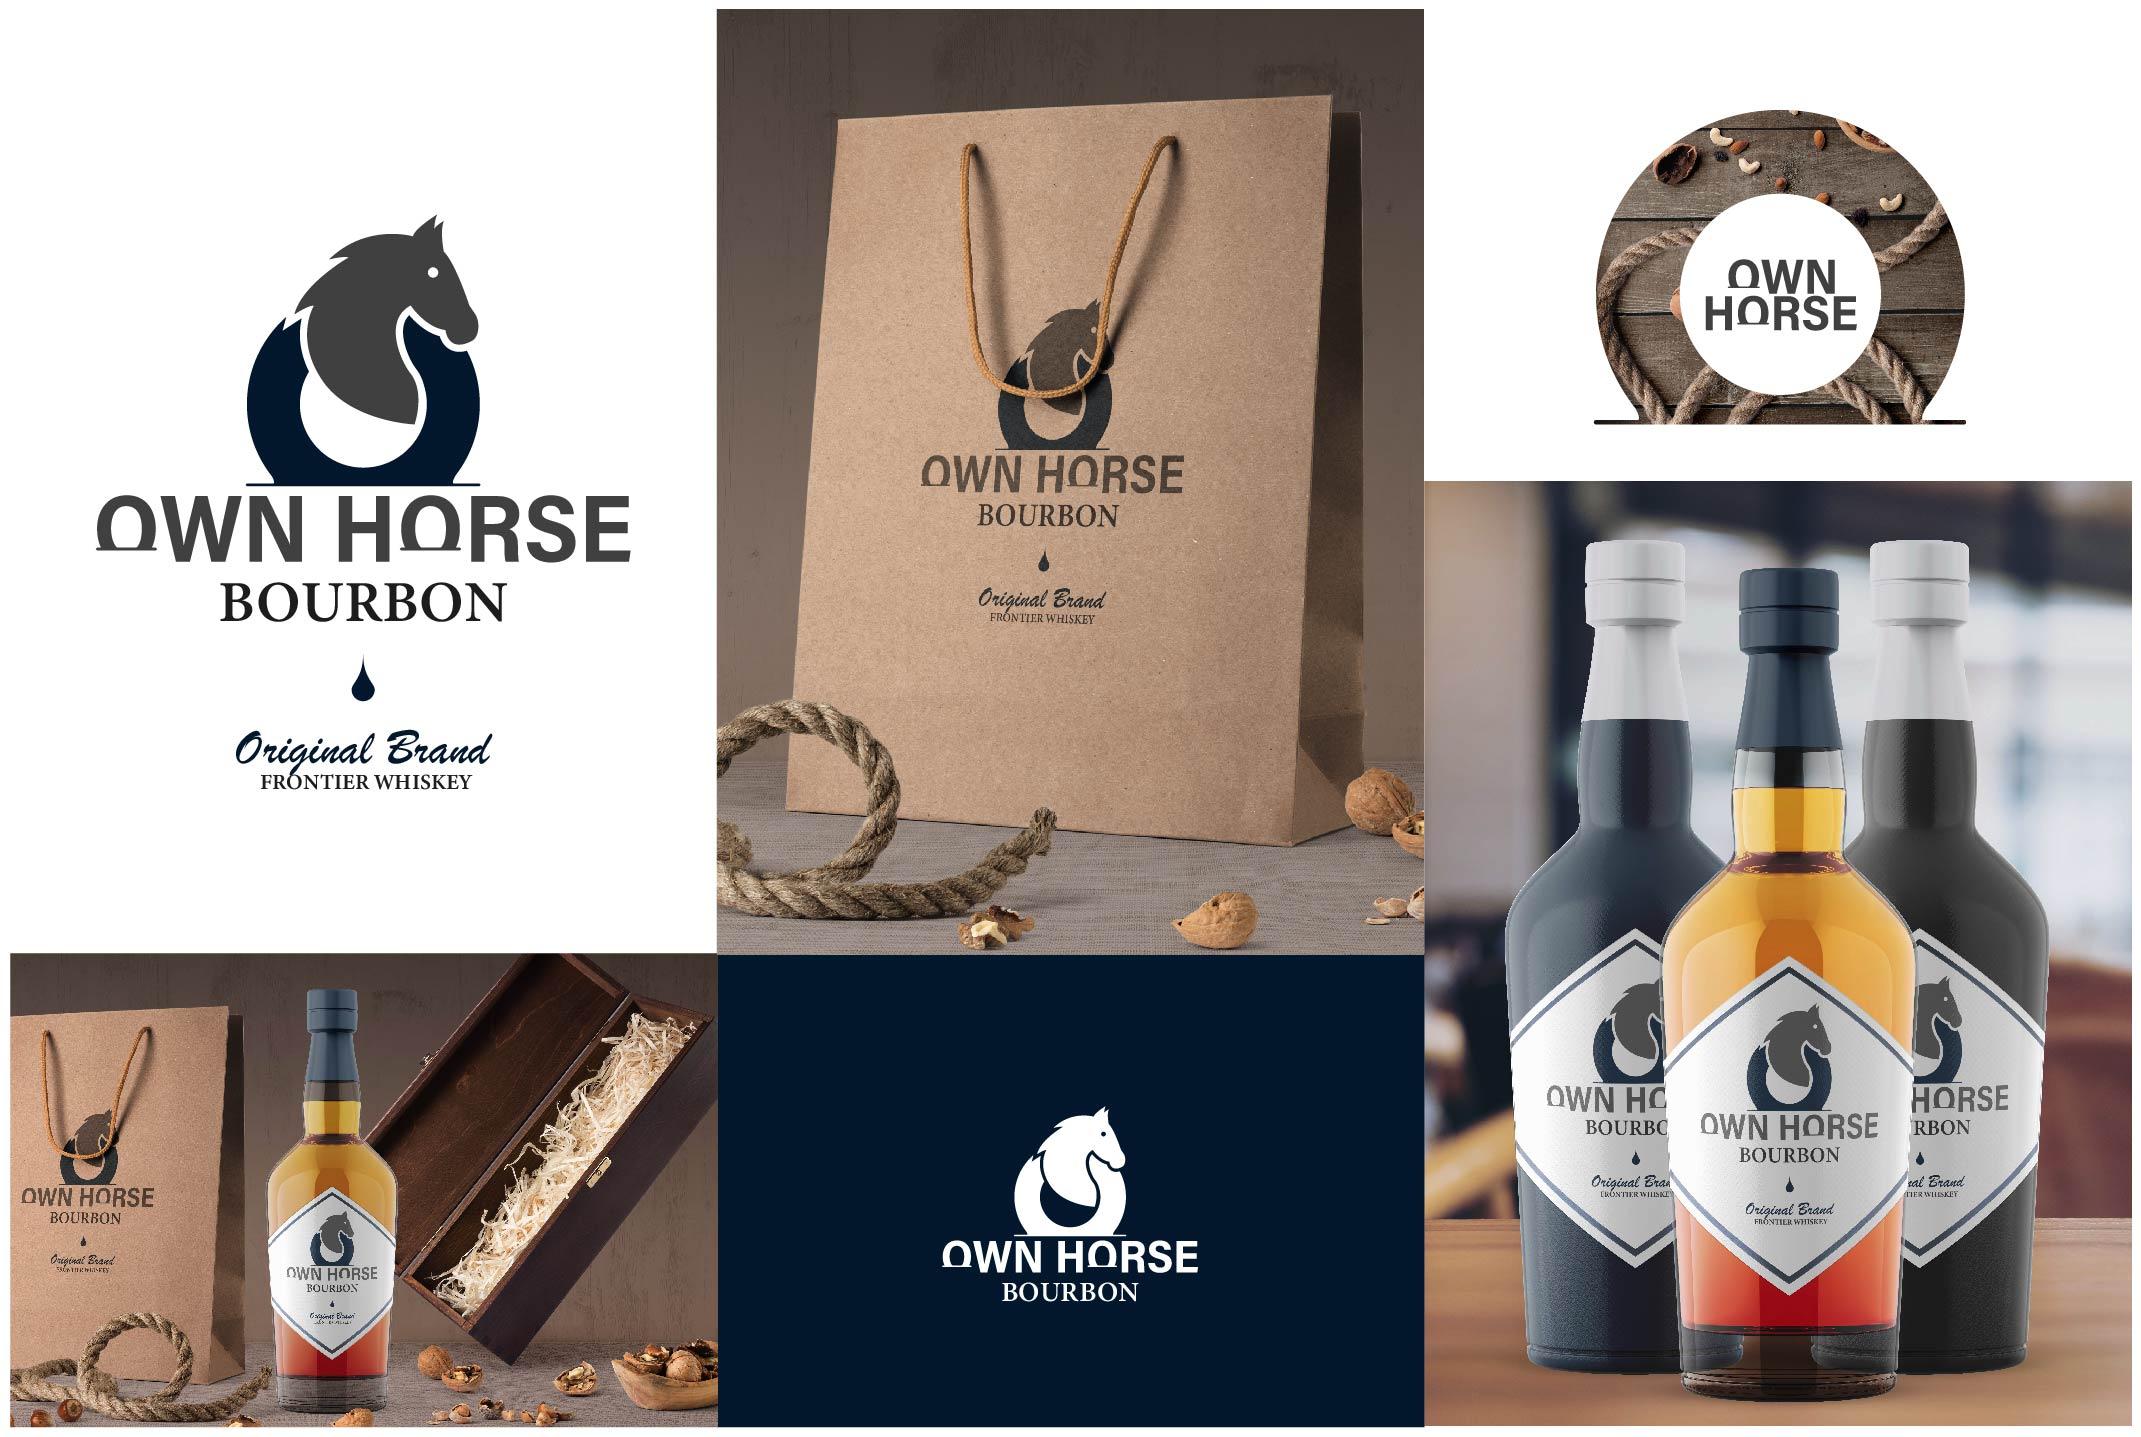 Own Horse Bourbon - Brand Identity